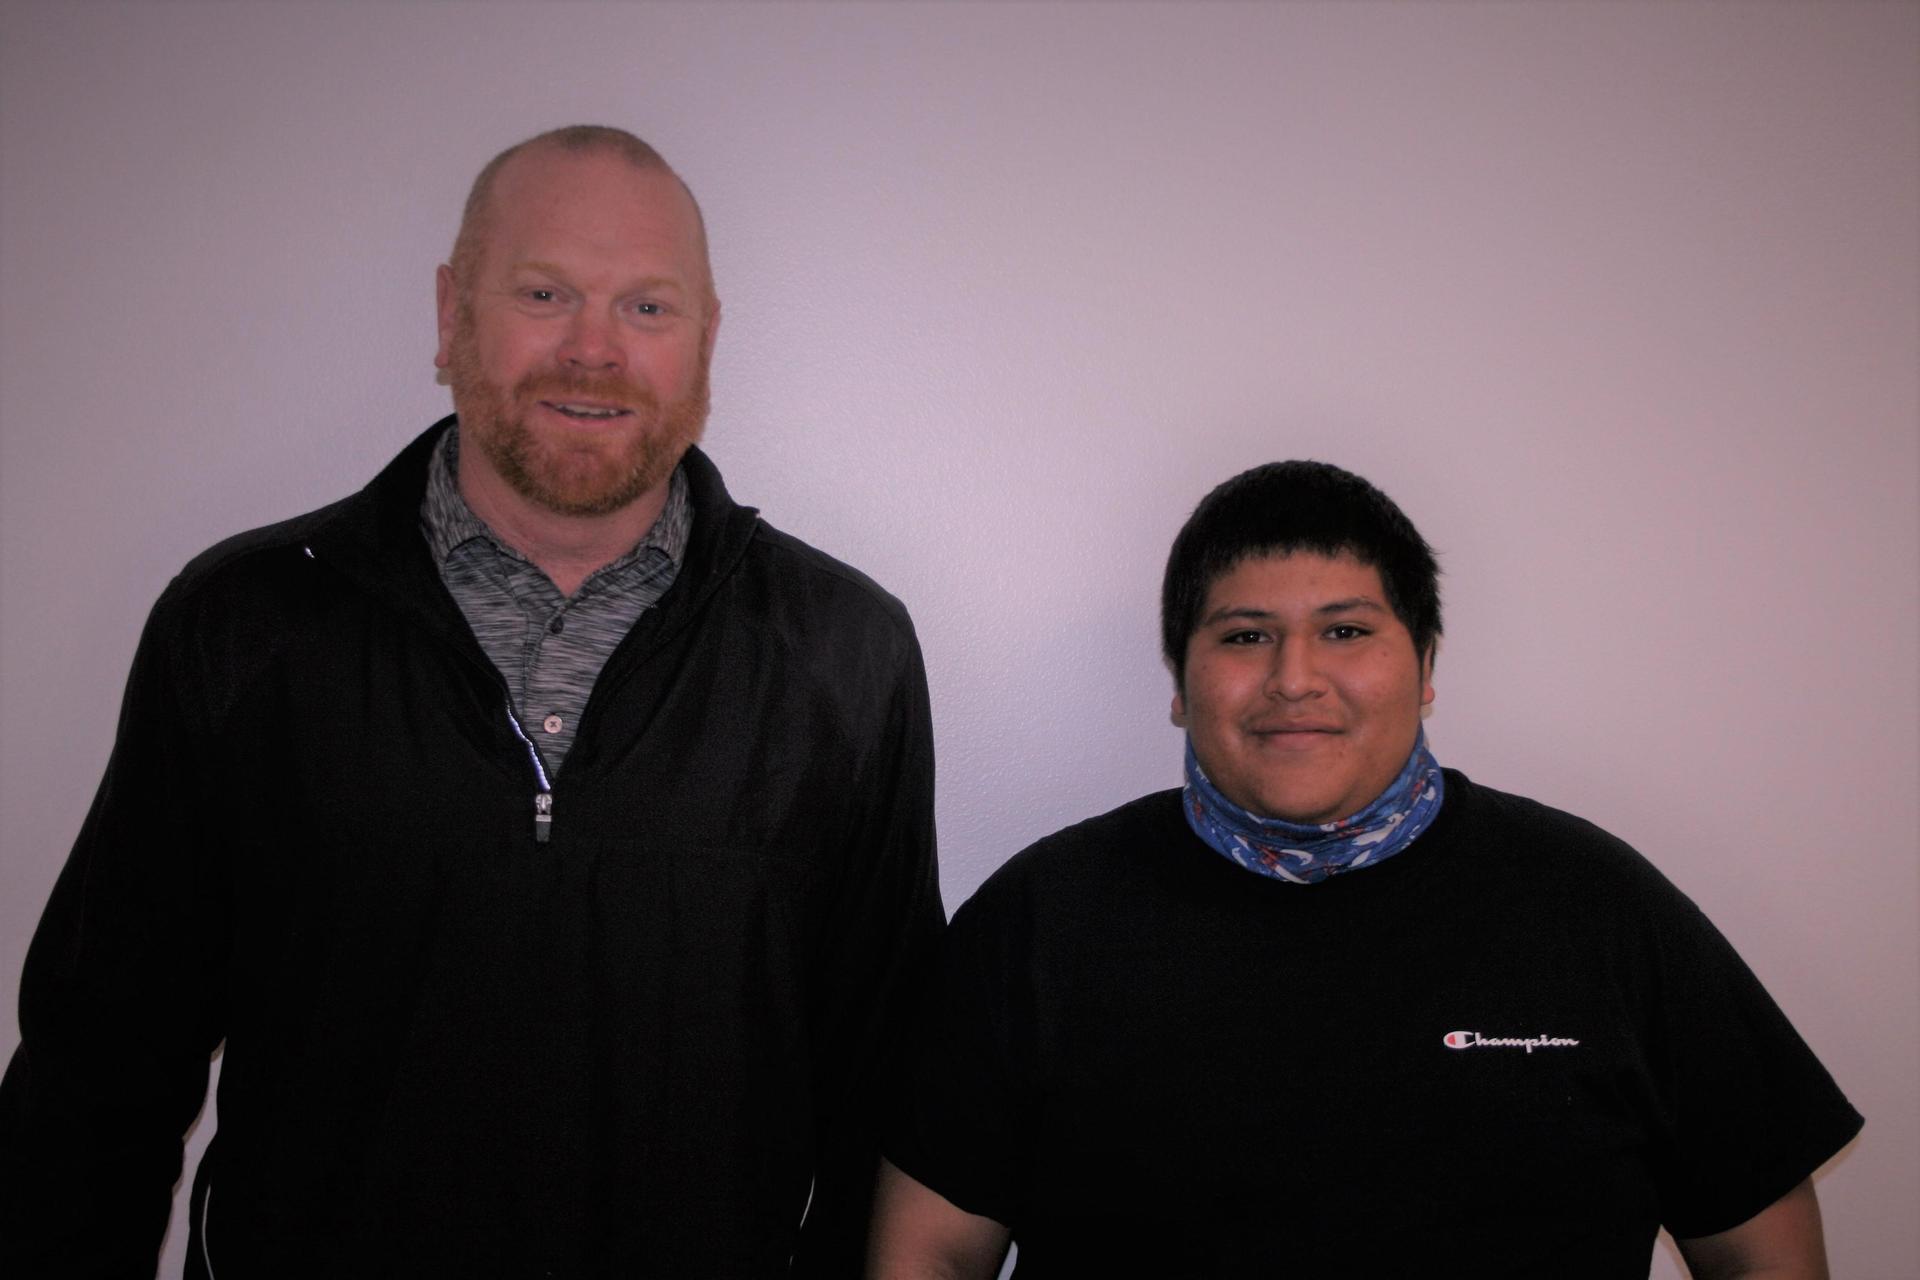 Mr. Edwards and Josue Paulino